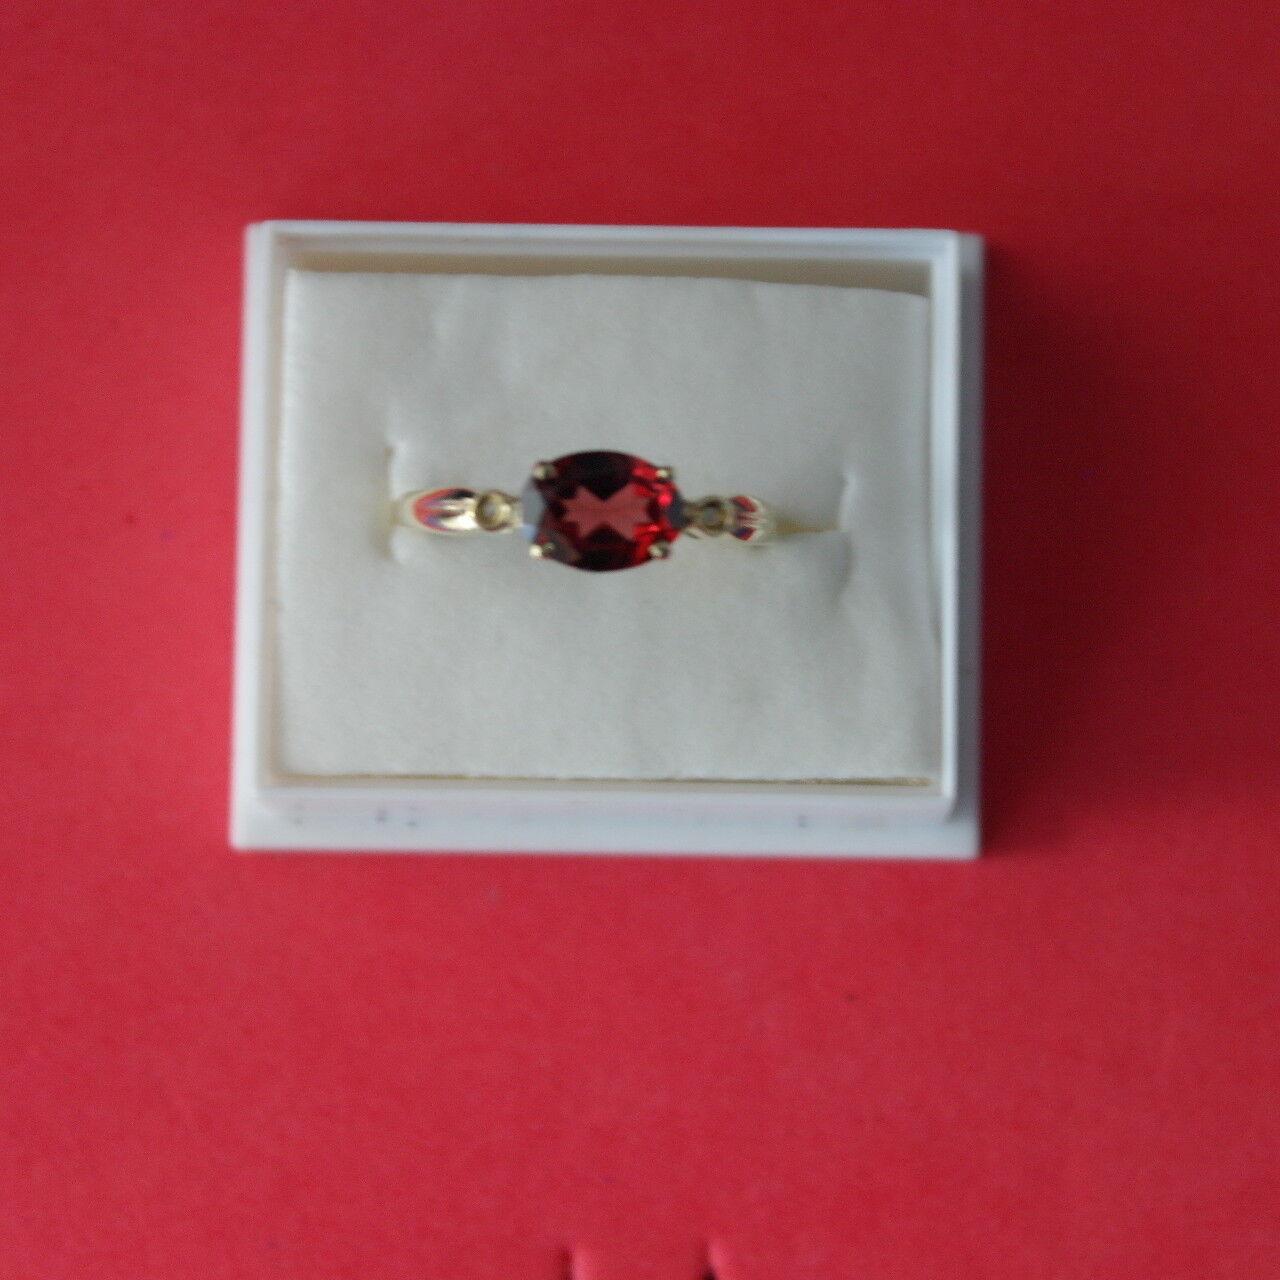 ELEGANT 9CT YELLOW gold NATURAL GARNET & DIAMOND RING SIZE O IN GIFT BOX